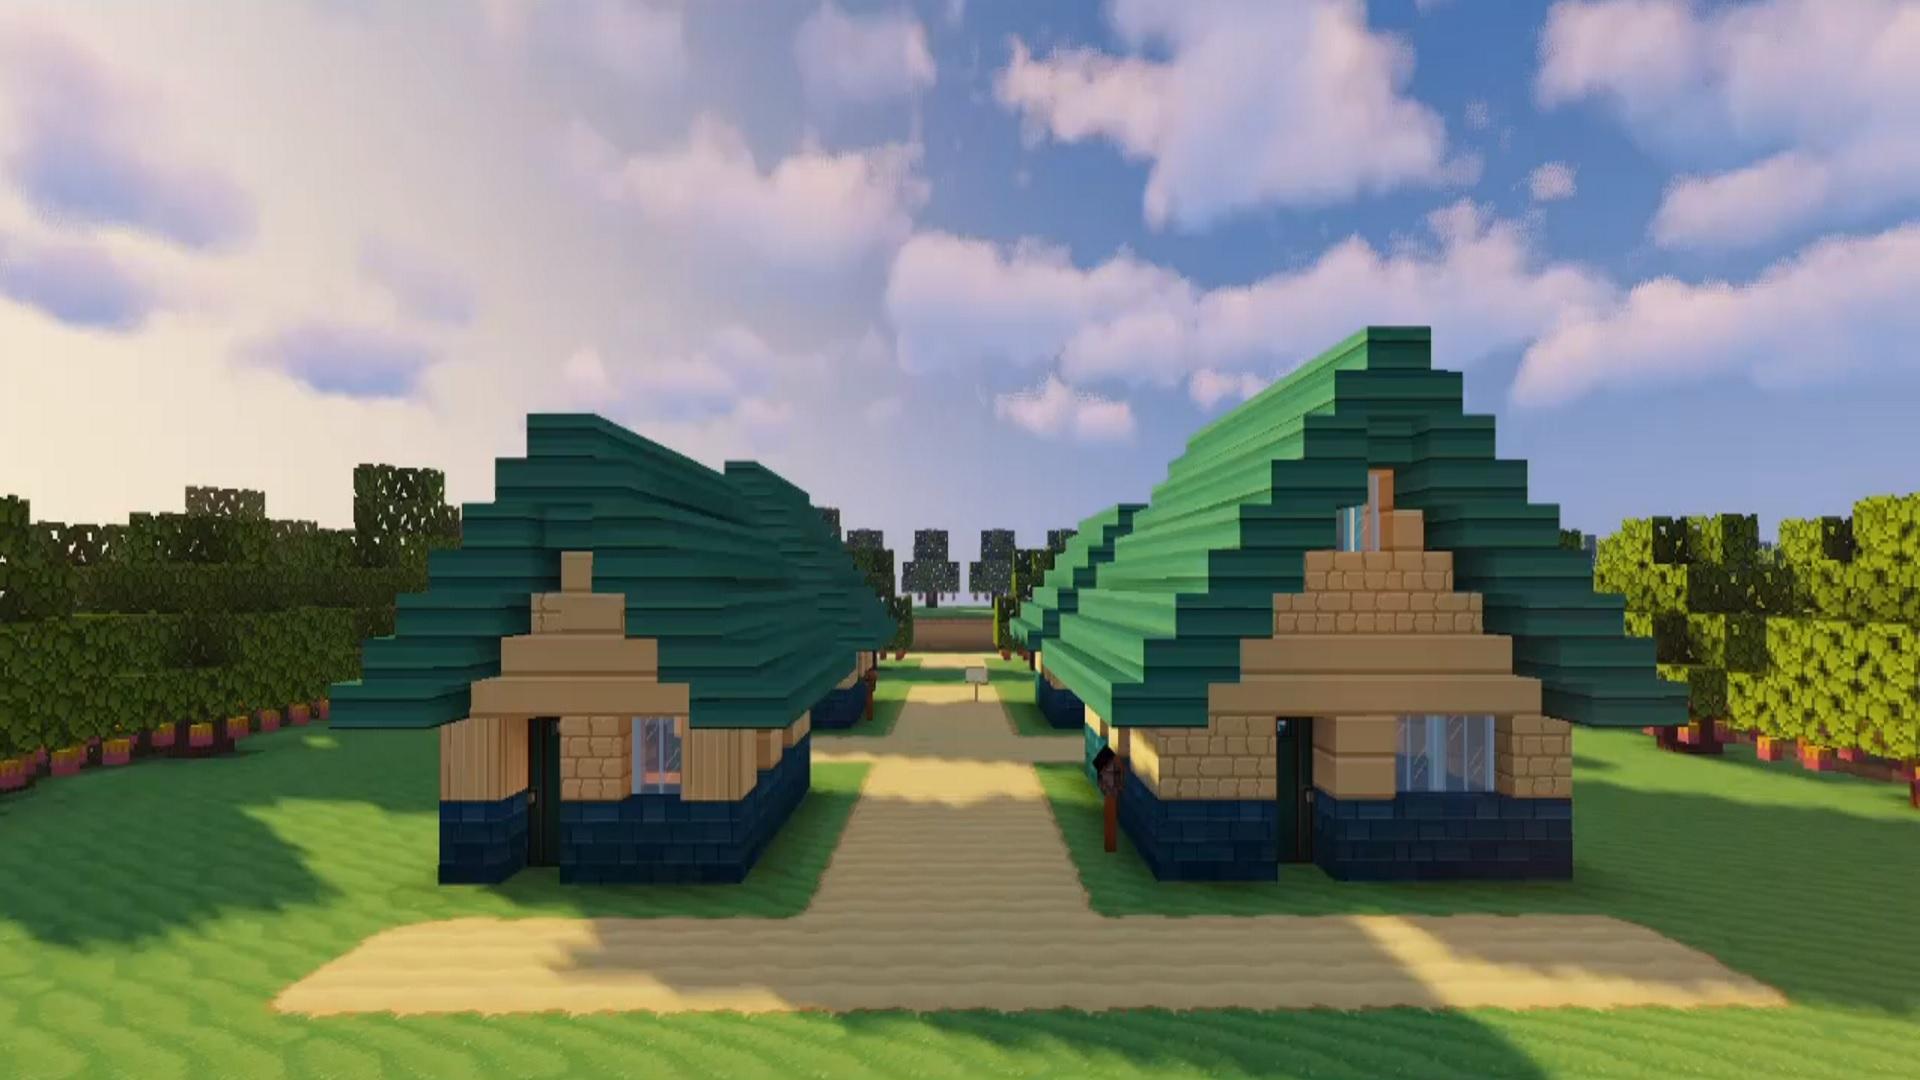 Twinleaf Pokemon Diamond & Pearl